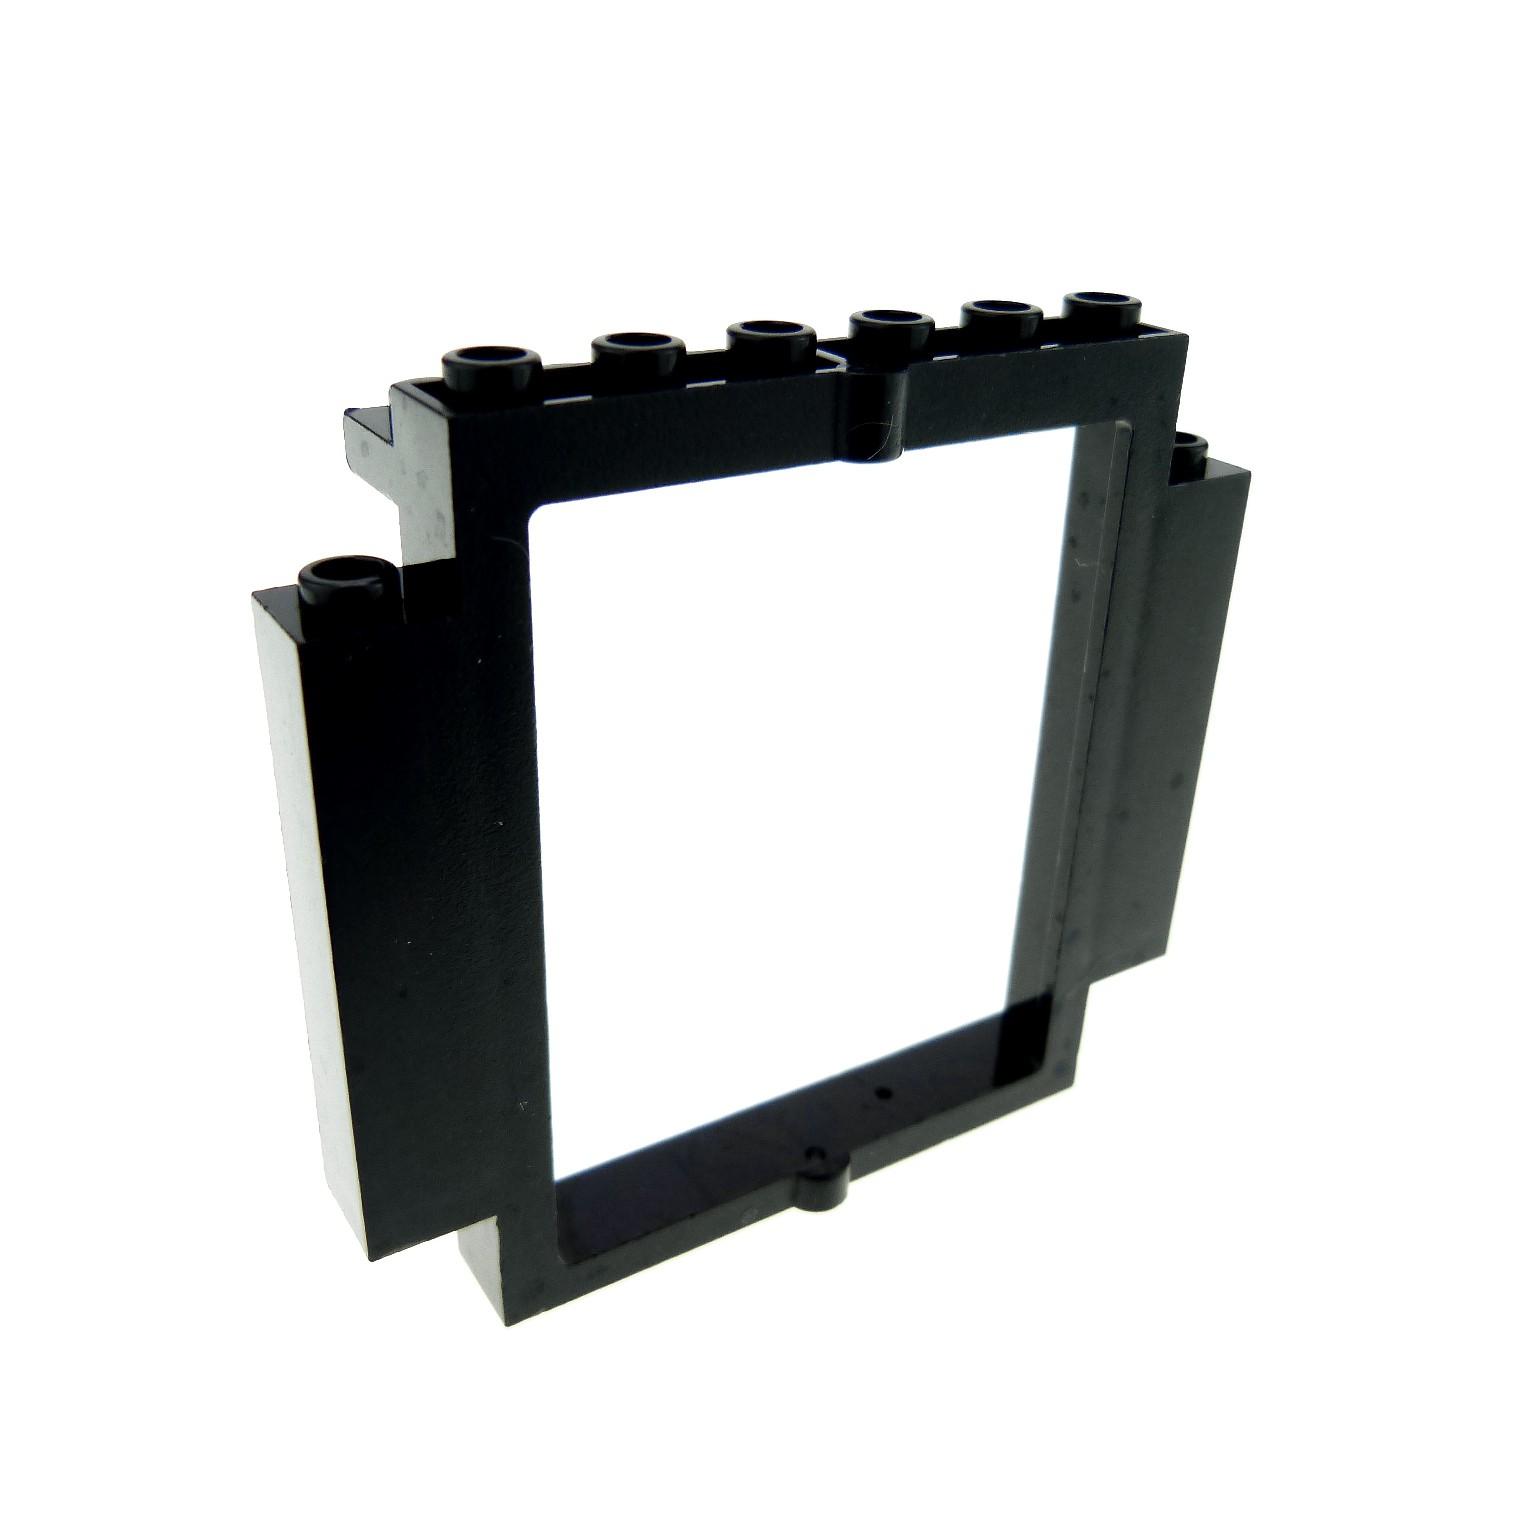 1 x Lego brick black Door Frame 2 x 8 x 6 Swivel with Bottom Notches ...